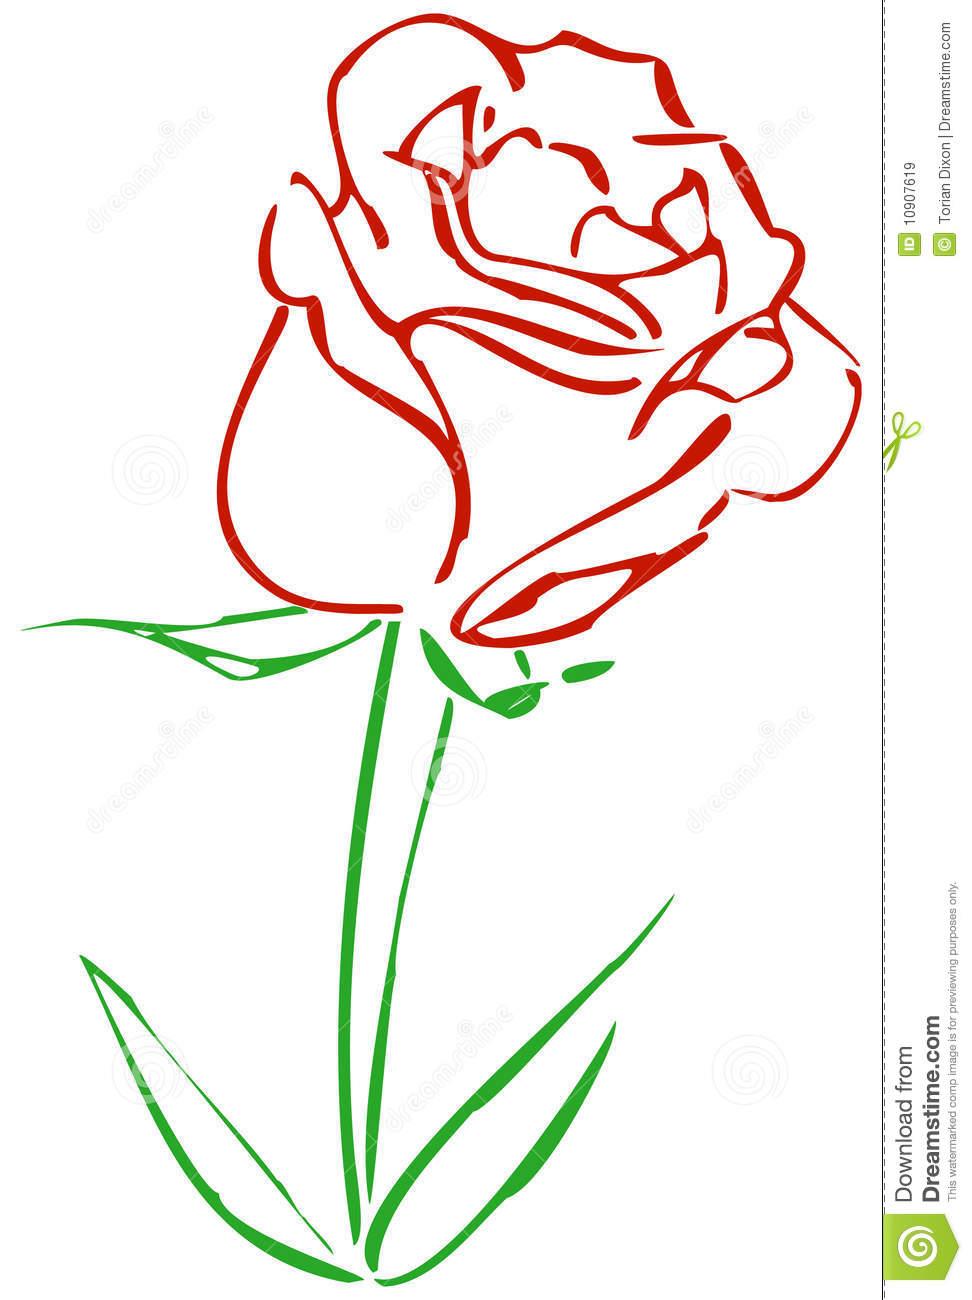 Simple Rose Clip Art   Clipart Panda - Free Clipart Images